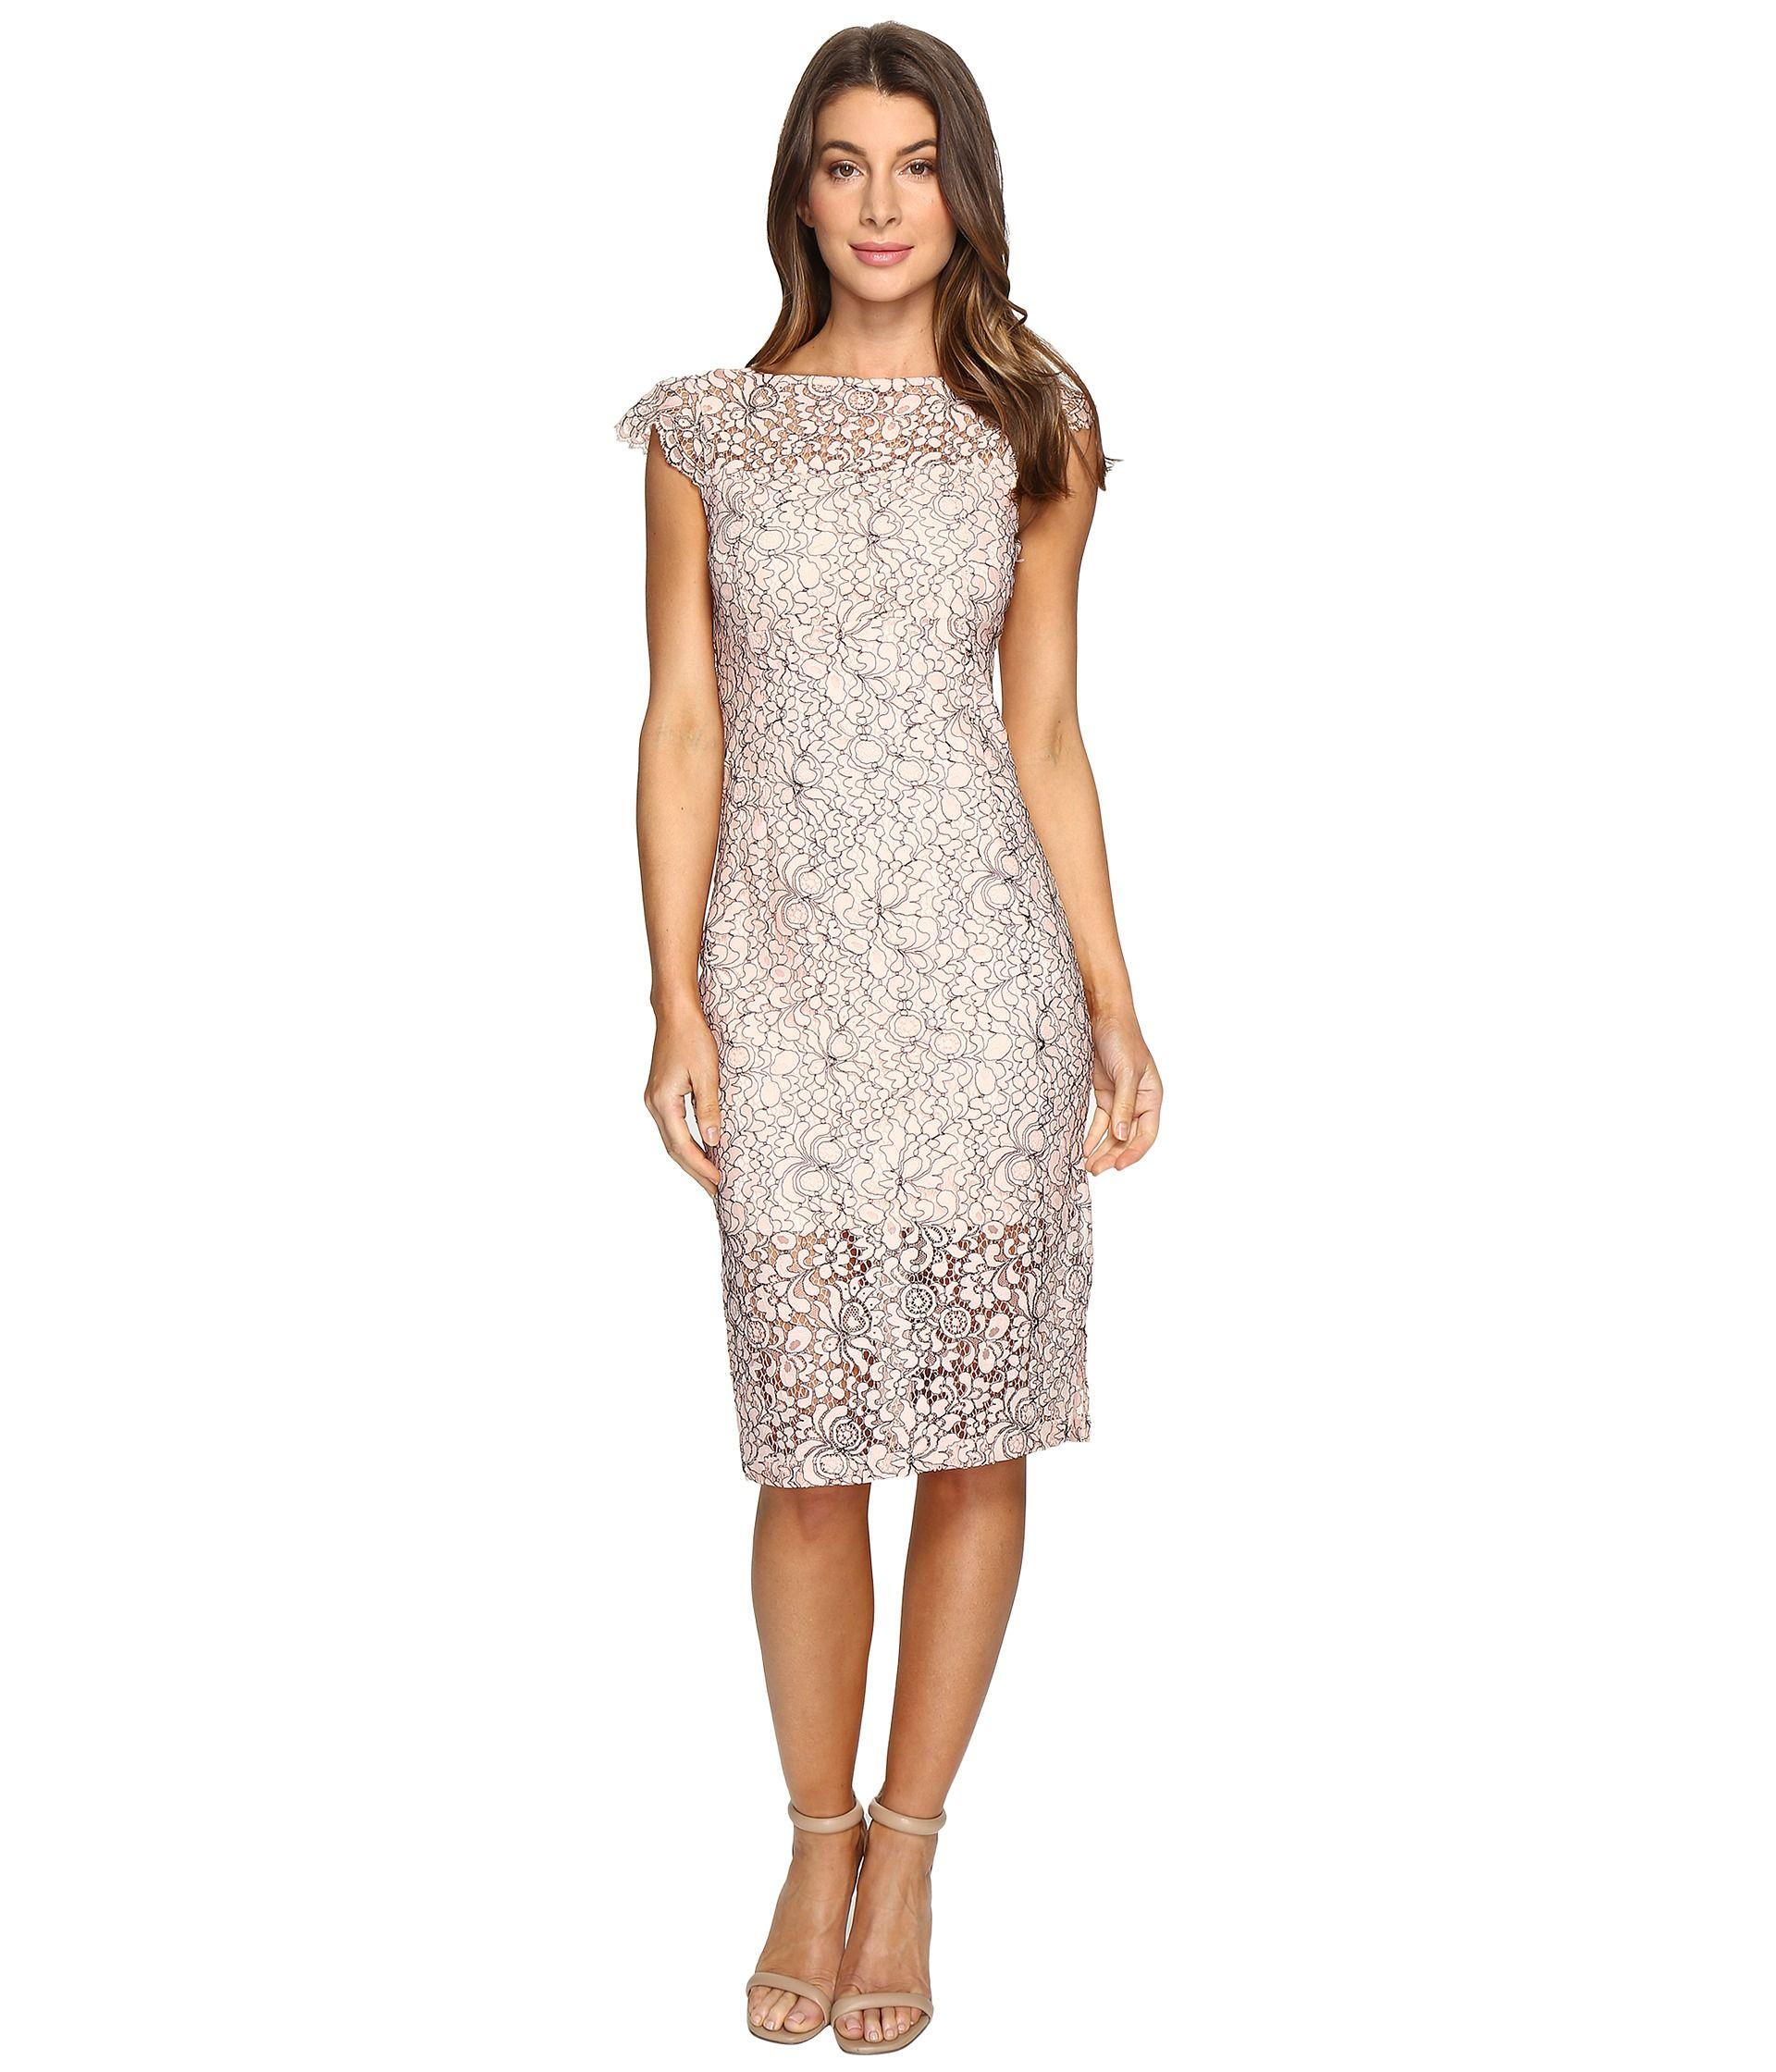 Cora Skinner Zappos 2017 Dresses Dress Cover Lace Midi Dress [ 2240 x 1920 Pixel ]